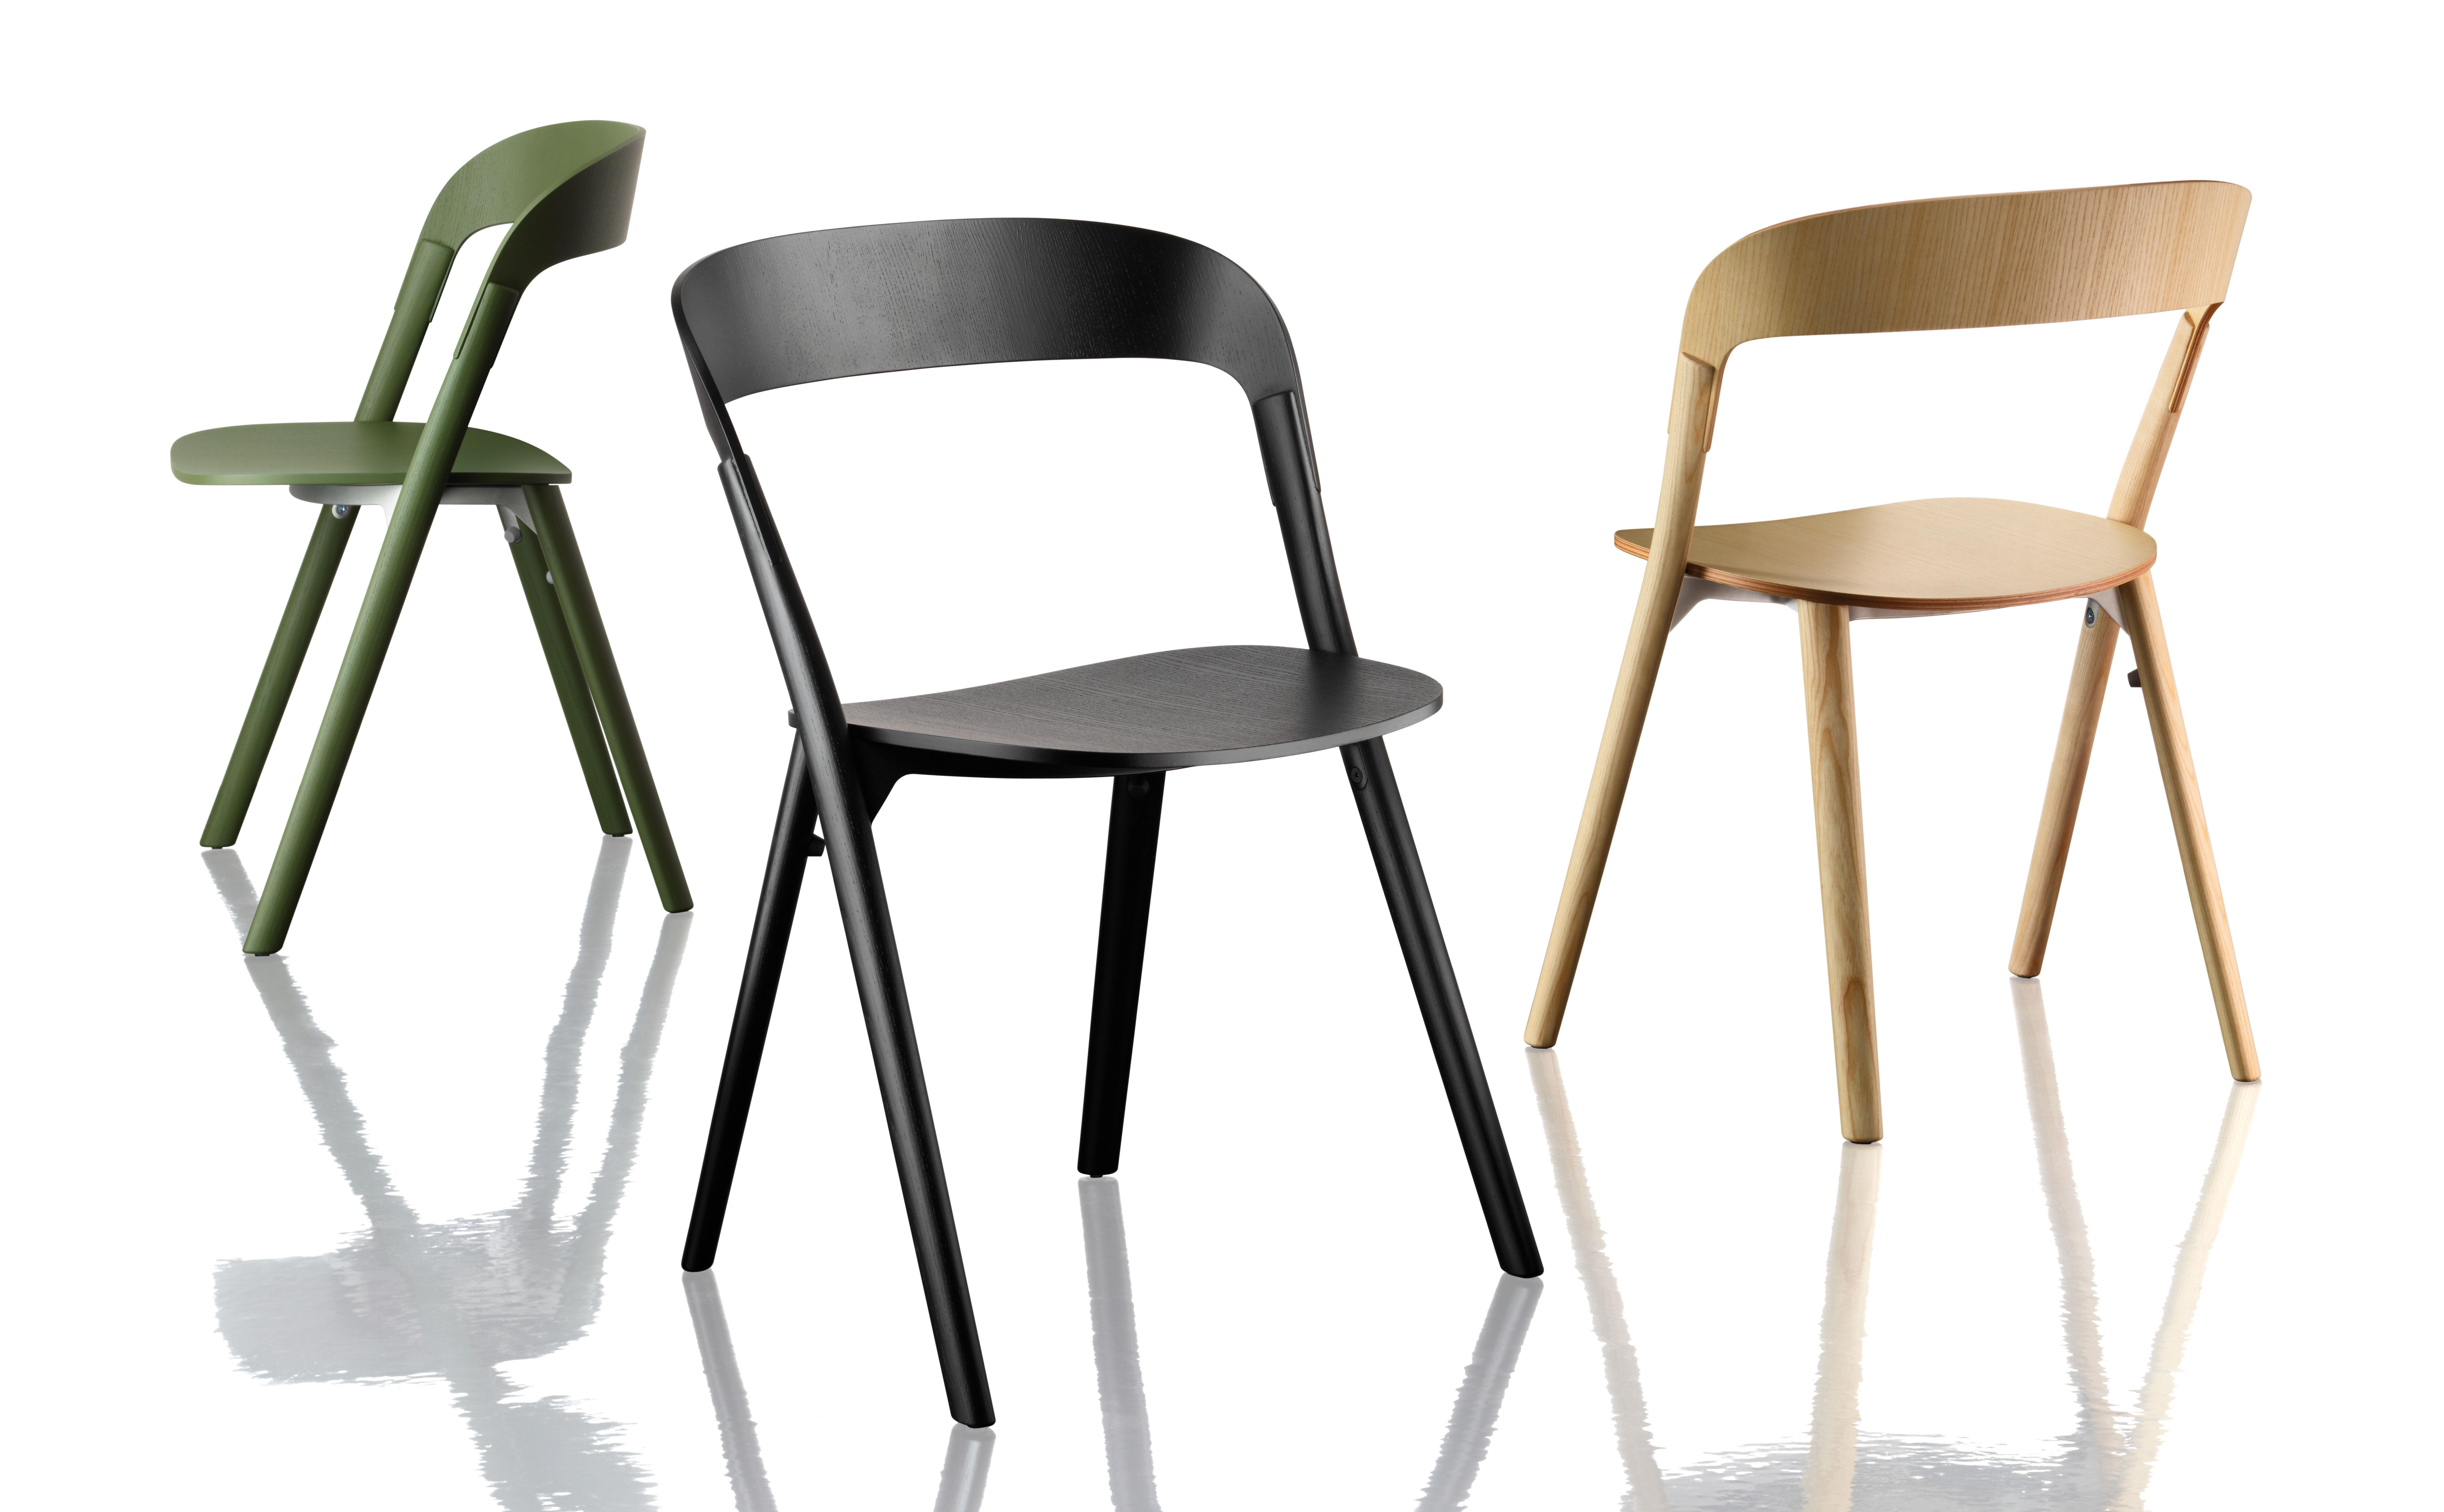 pid com beech armchair magis en chair steelwood ambientedirect